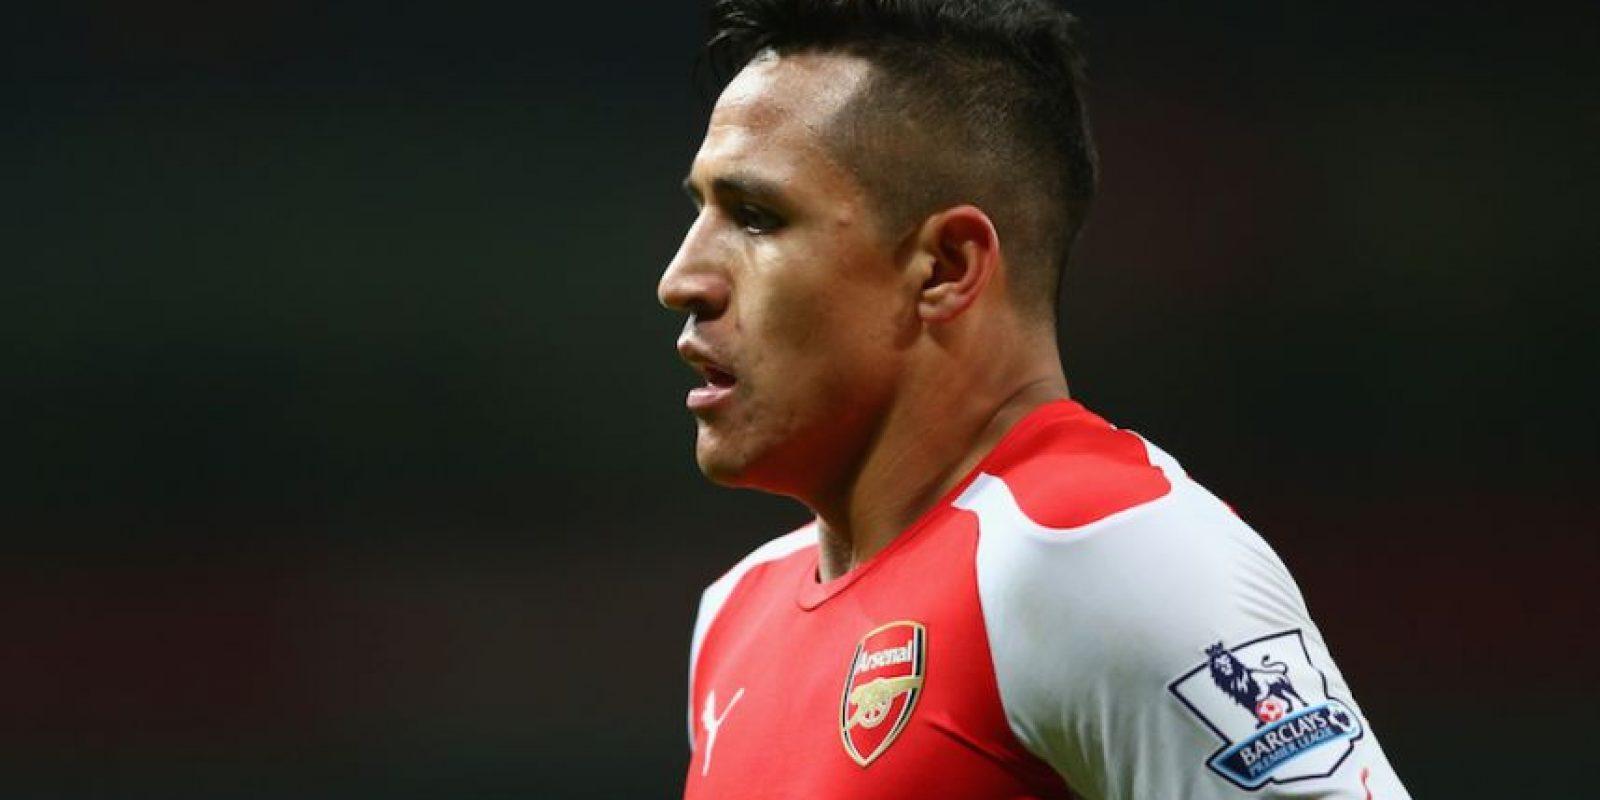 El futbolista del Arsenal ganó 11 millones de dólares. Foto:Getty Images